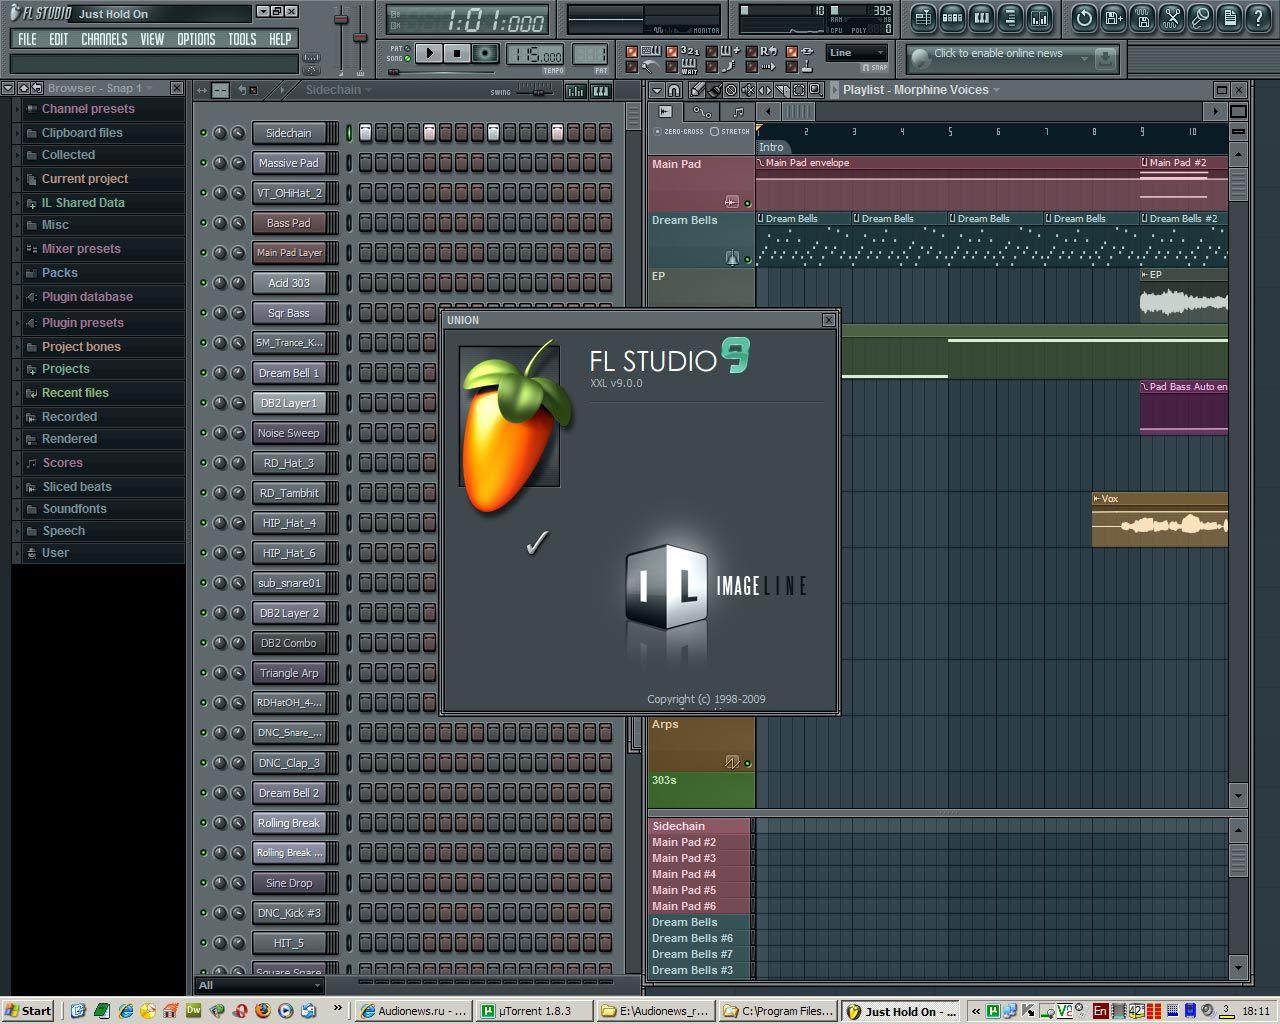 fl studio 12.3 crack download